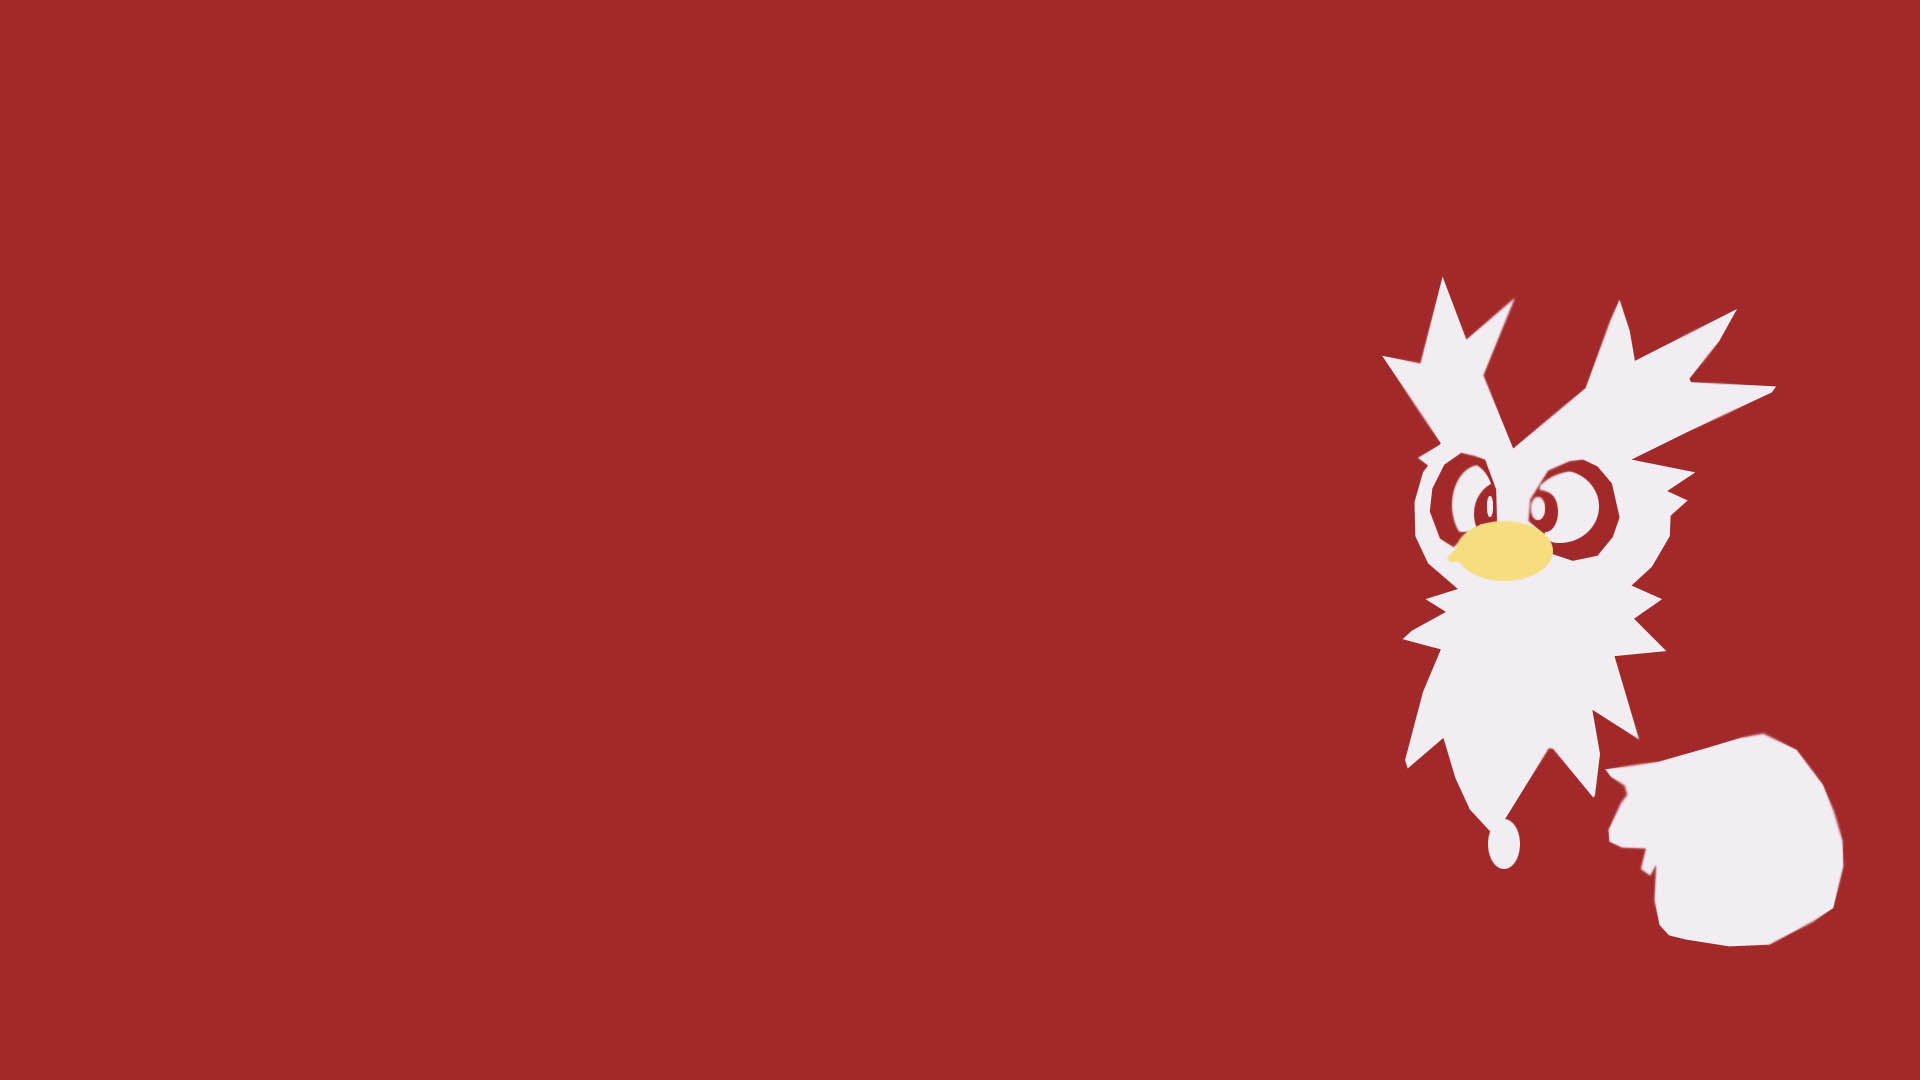 Pokemon Backgrounds 18260 1920x1200 px